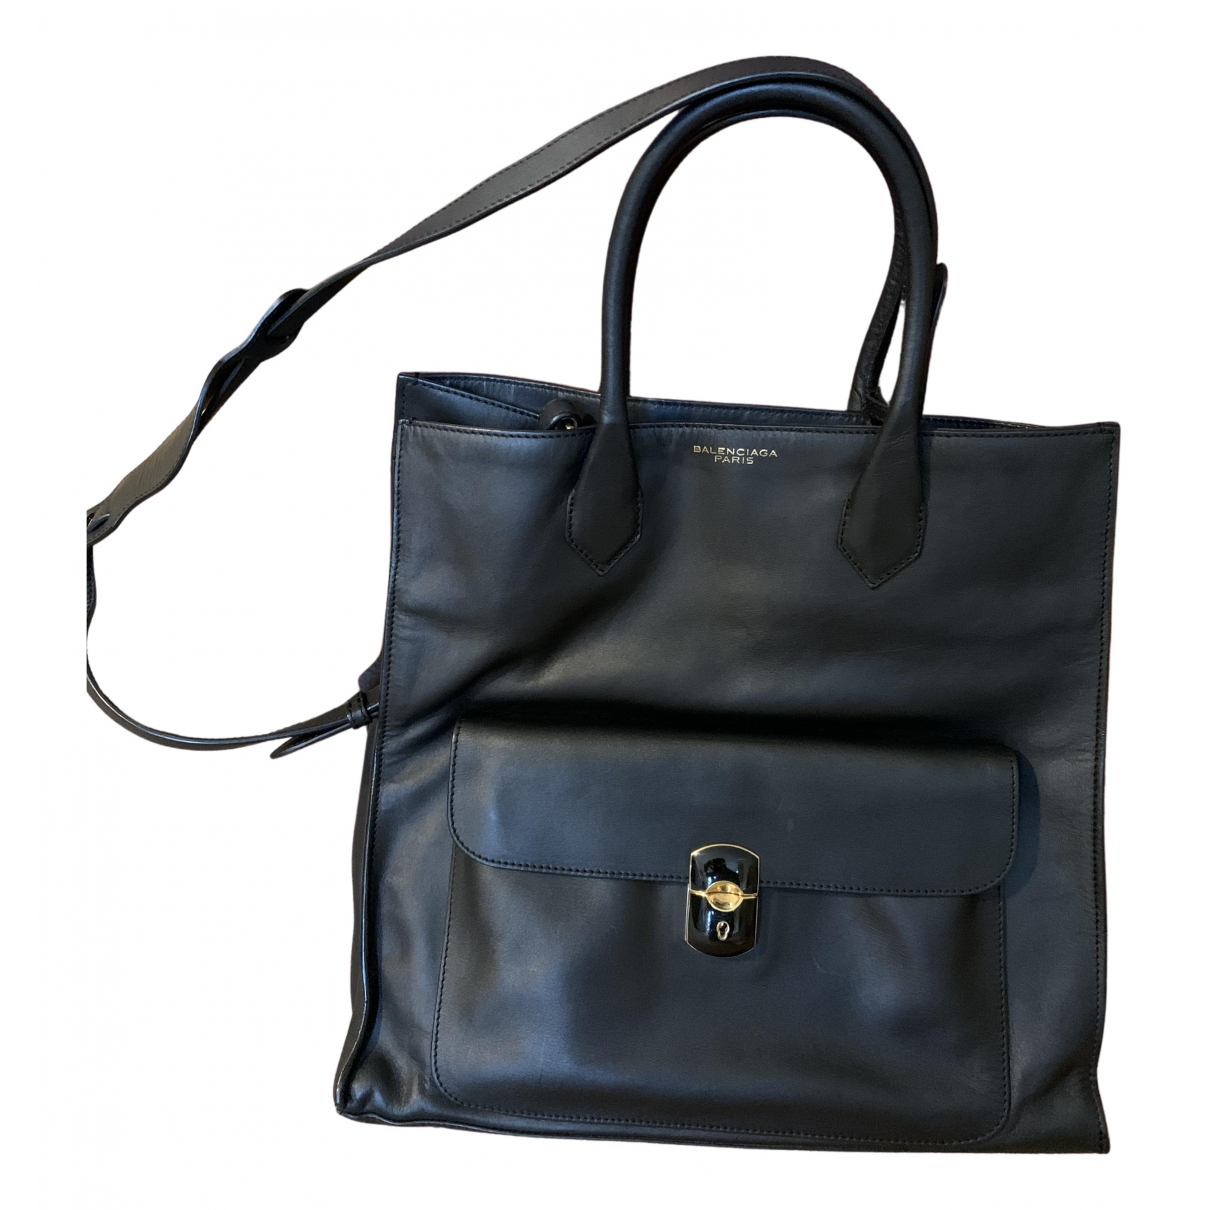 Balenciaga - Sac a main Padlock pour femme en cuir - noir